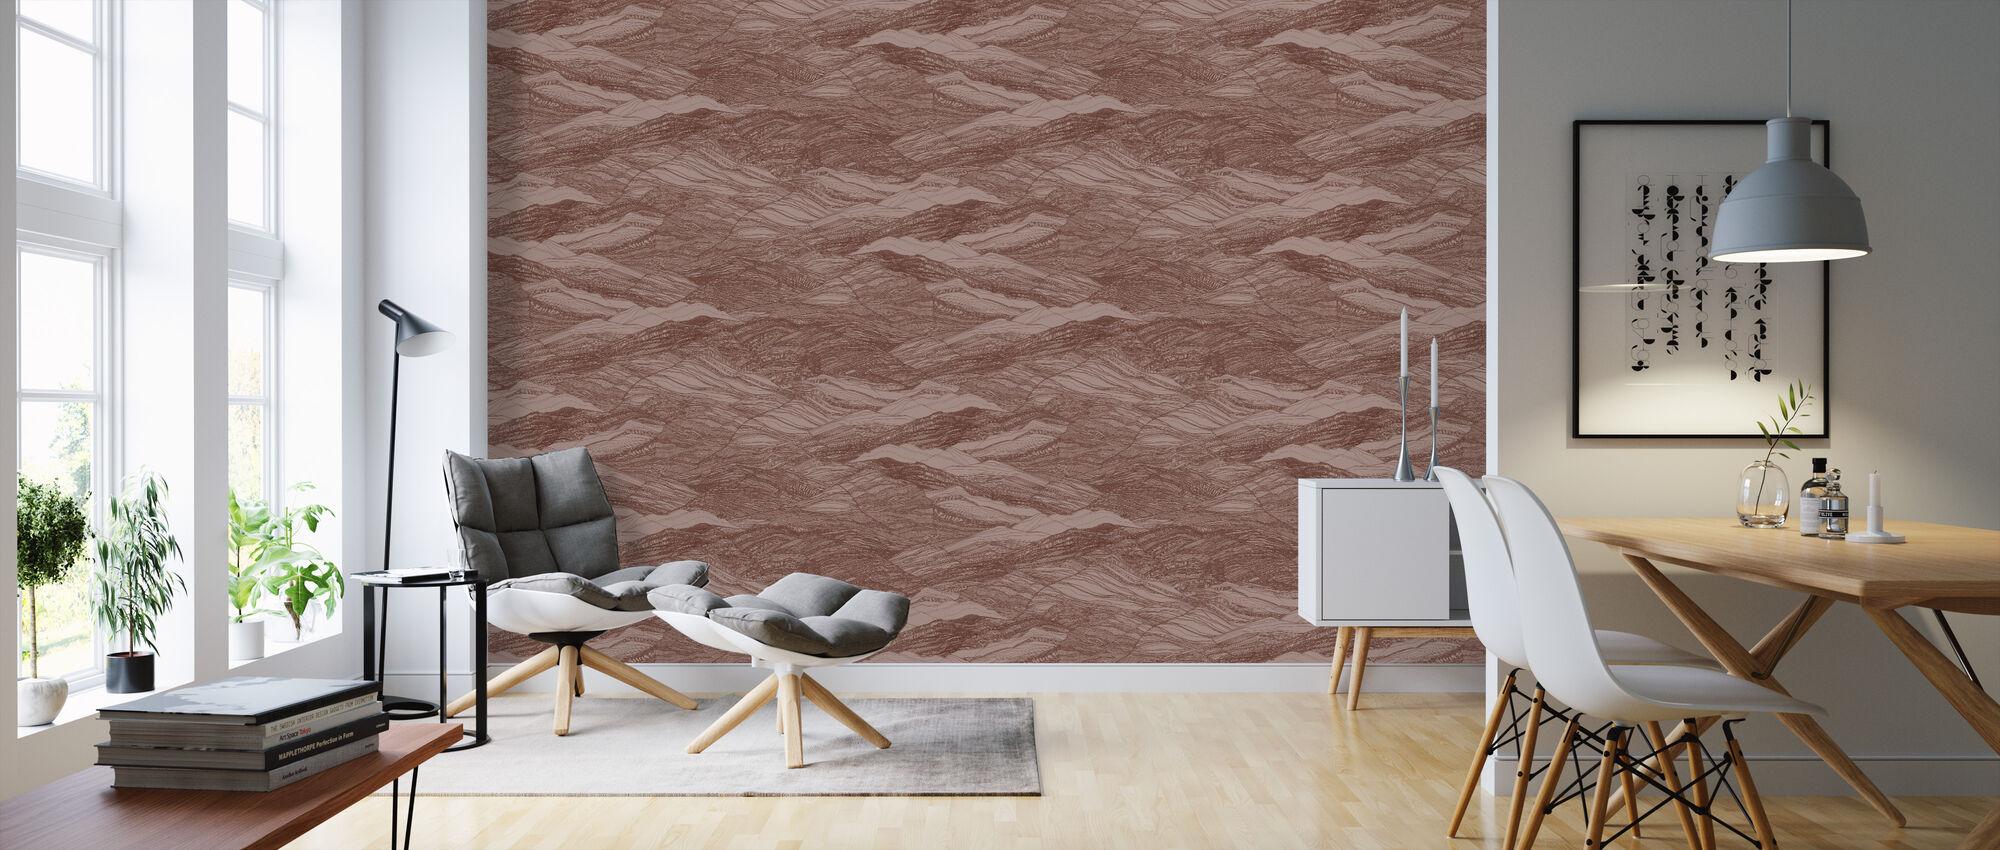 Duna Clay - Wallpaper - Living Room